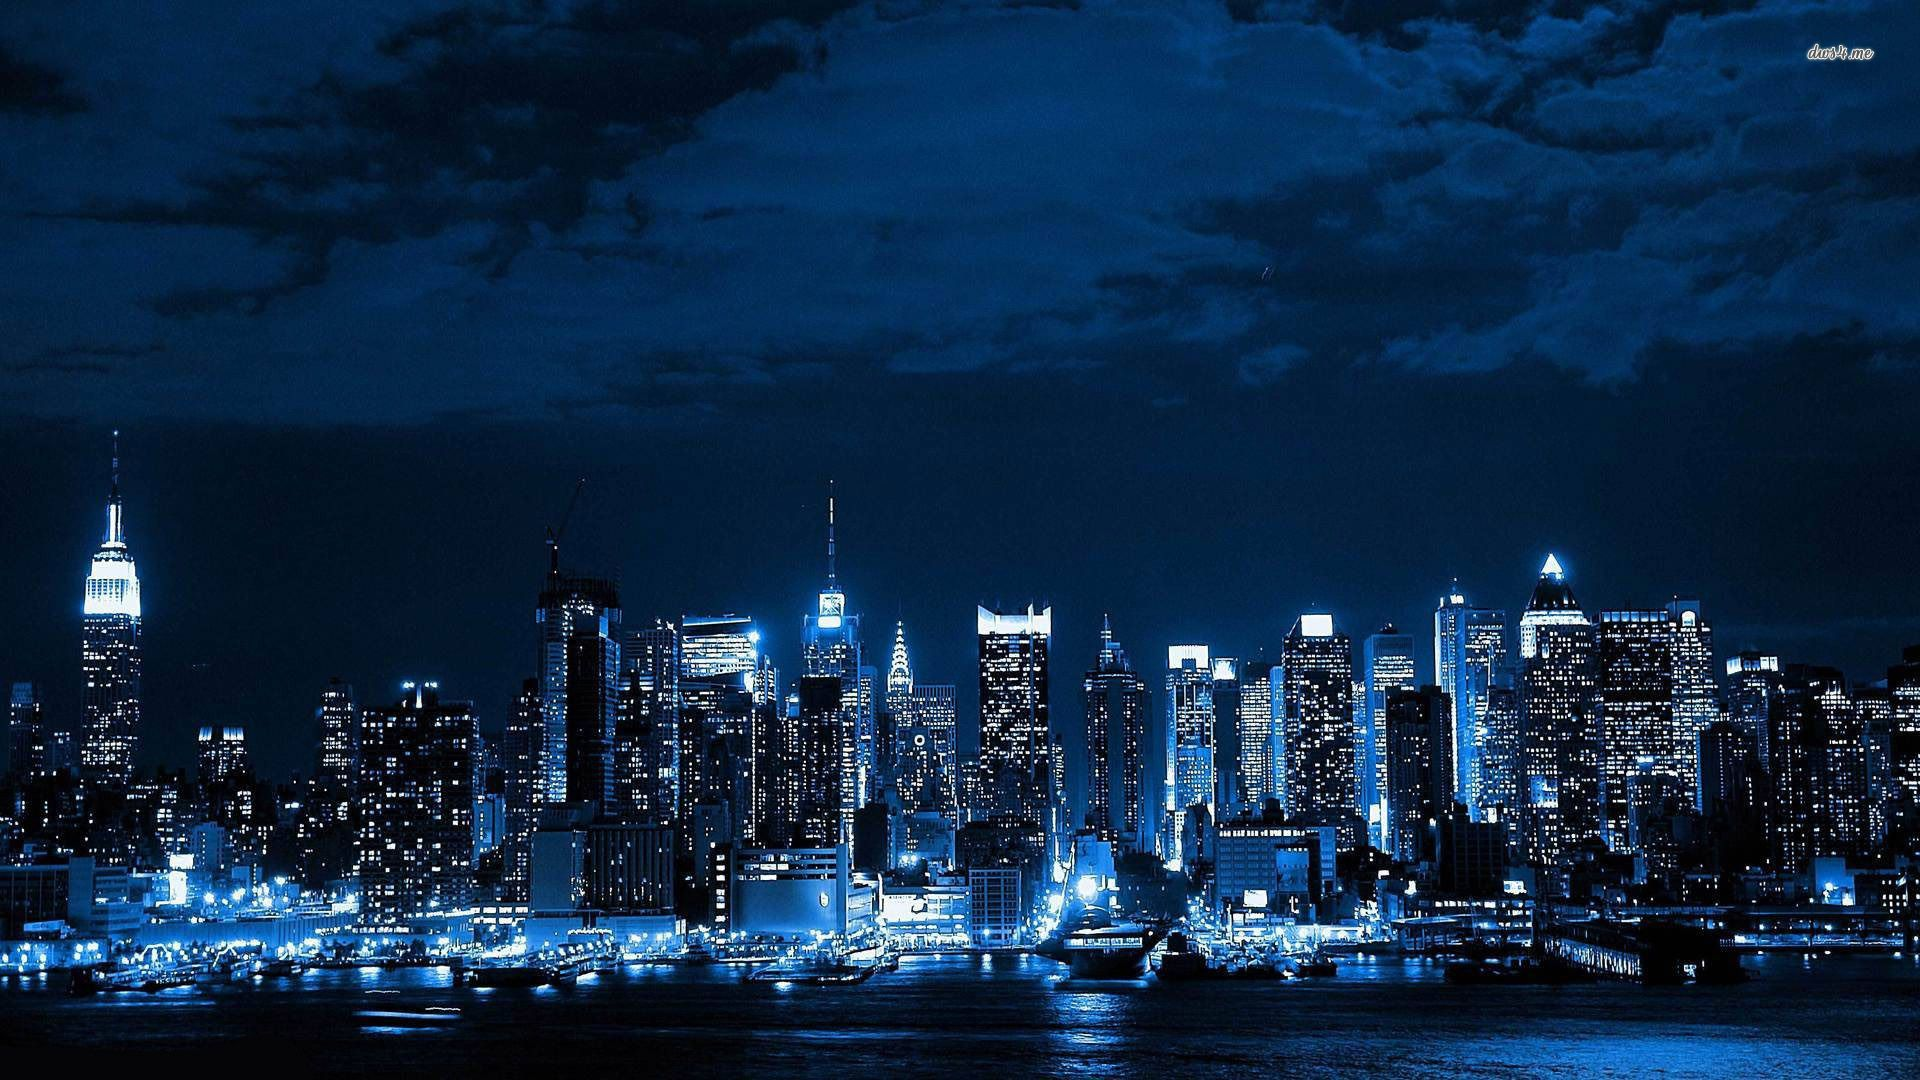 gotham city - Google Search | City | Pinterest | Gotham city